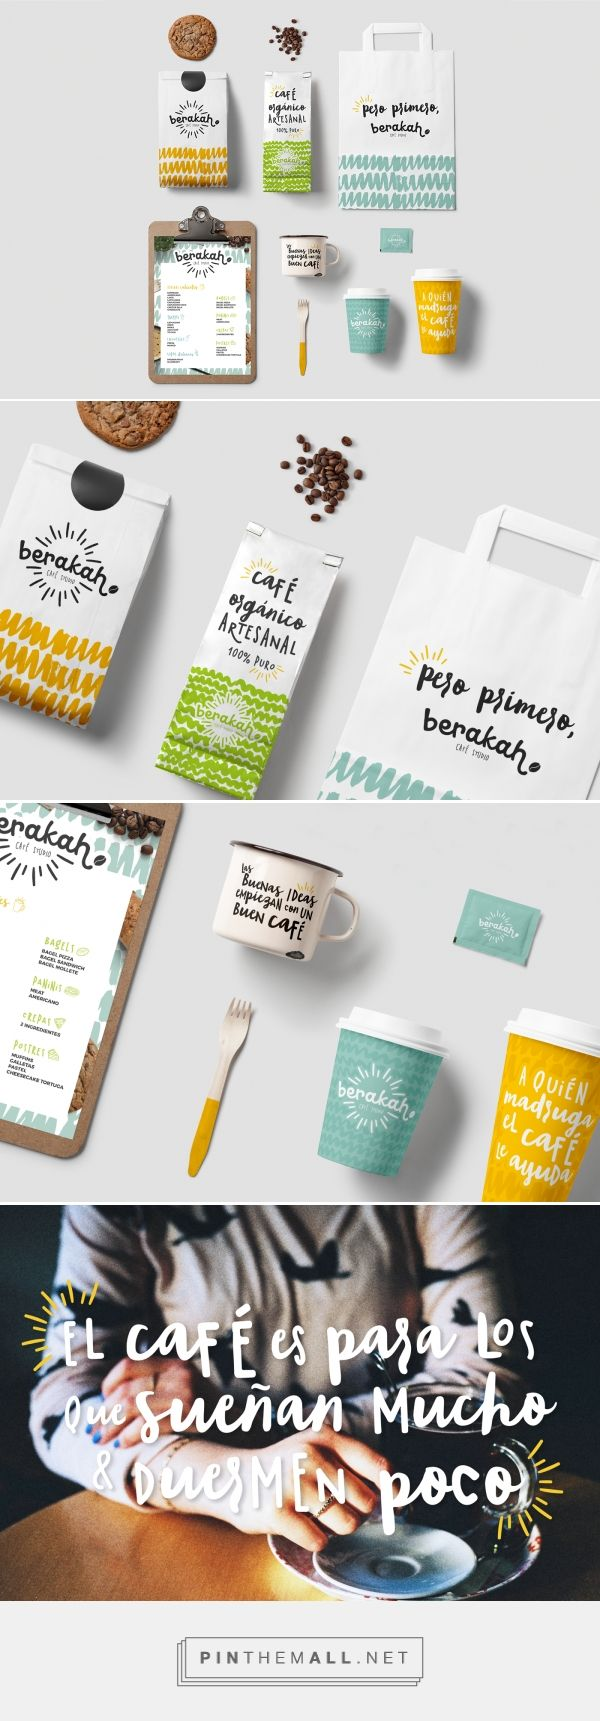 BERAKAH Caf Studio Branding graphic design and